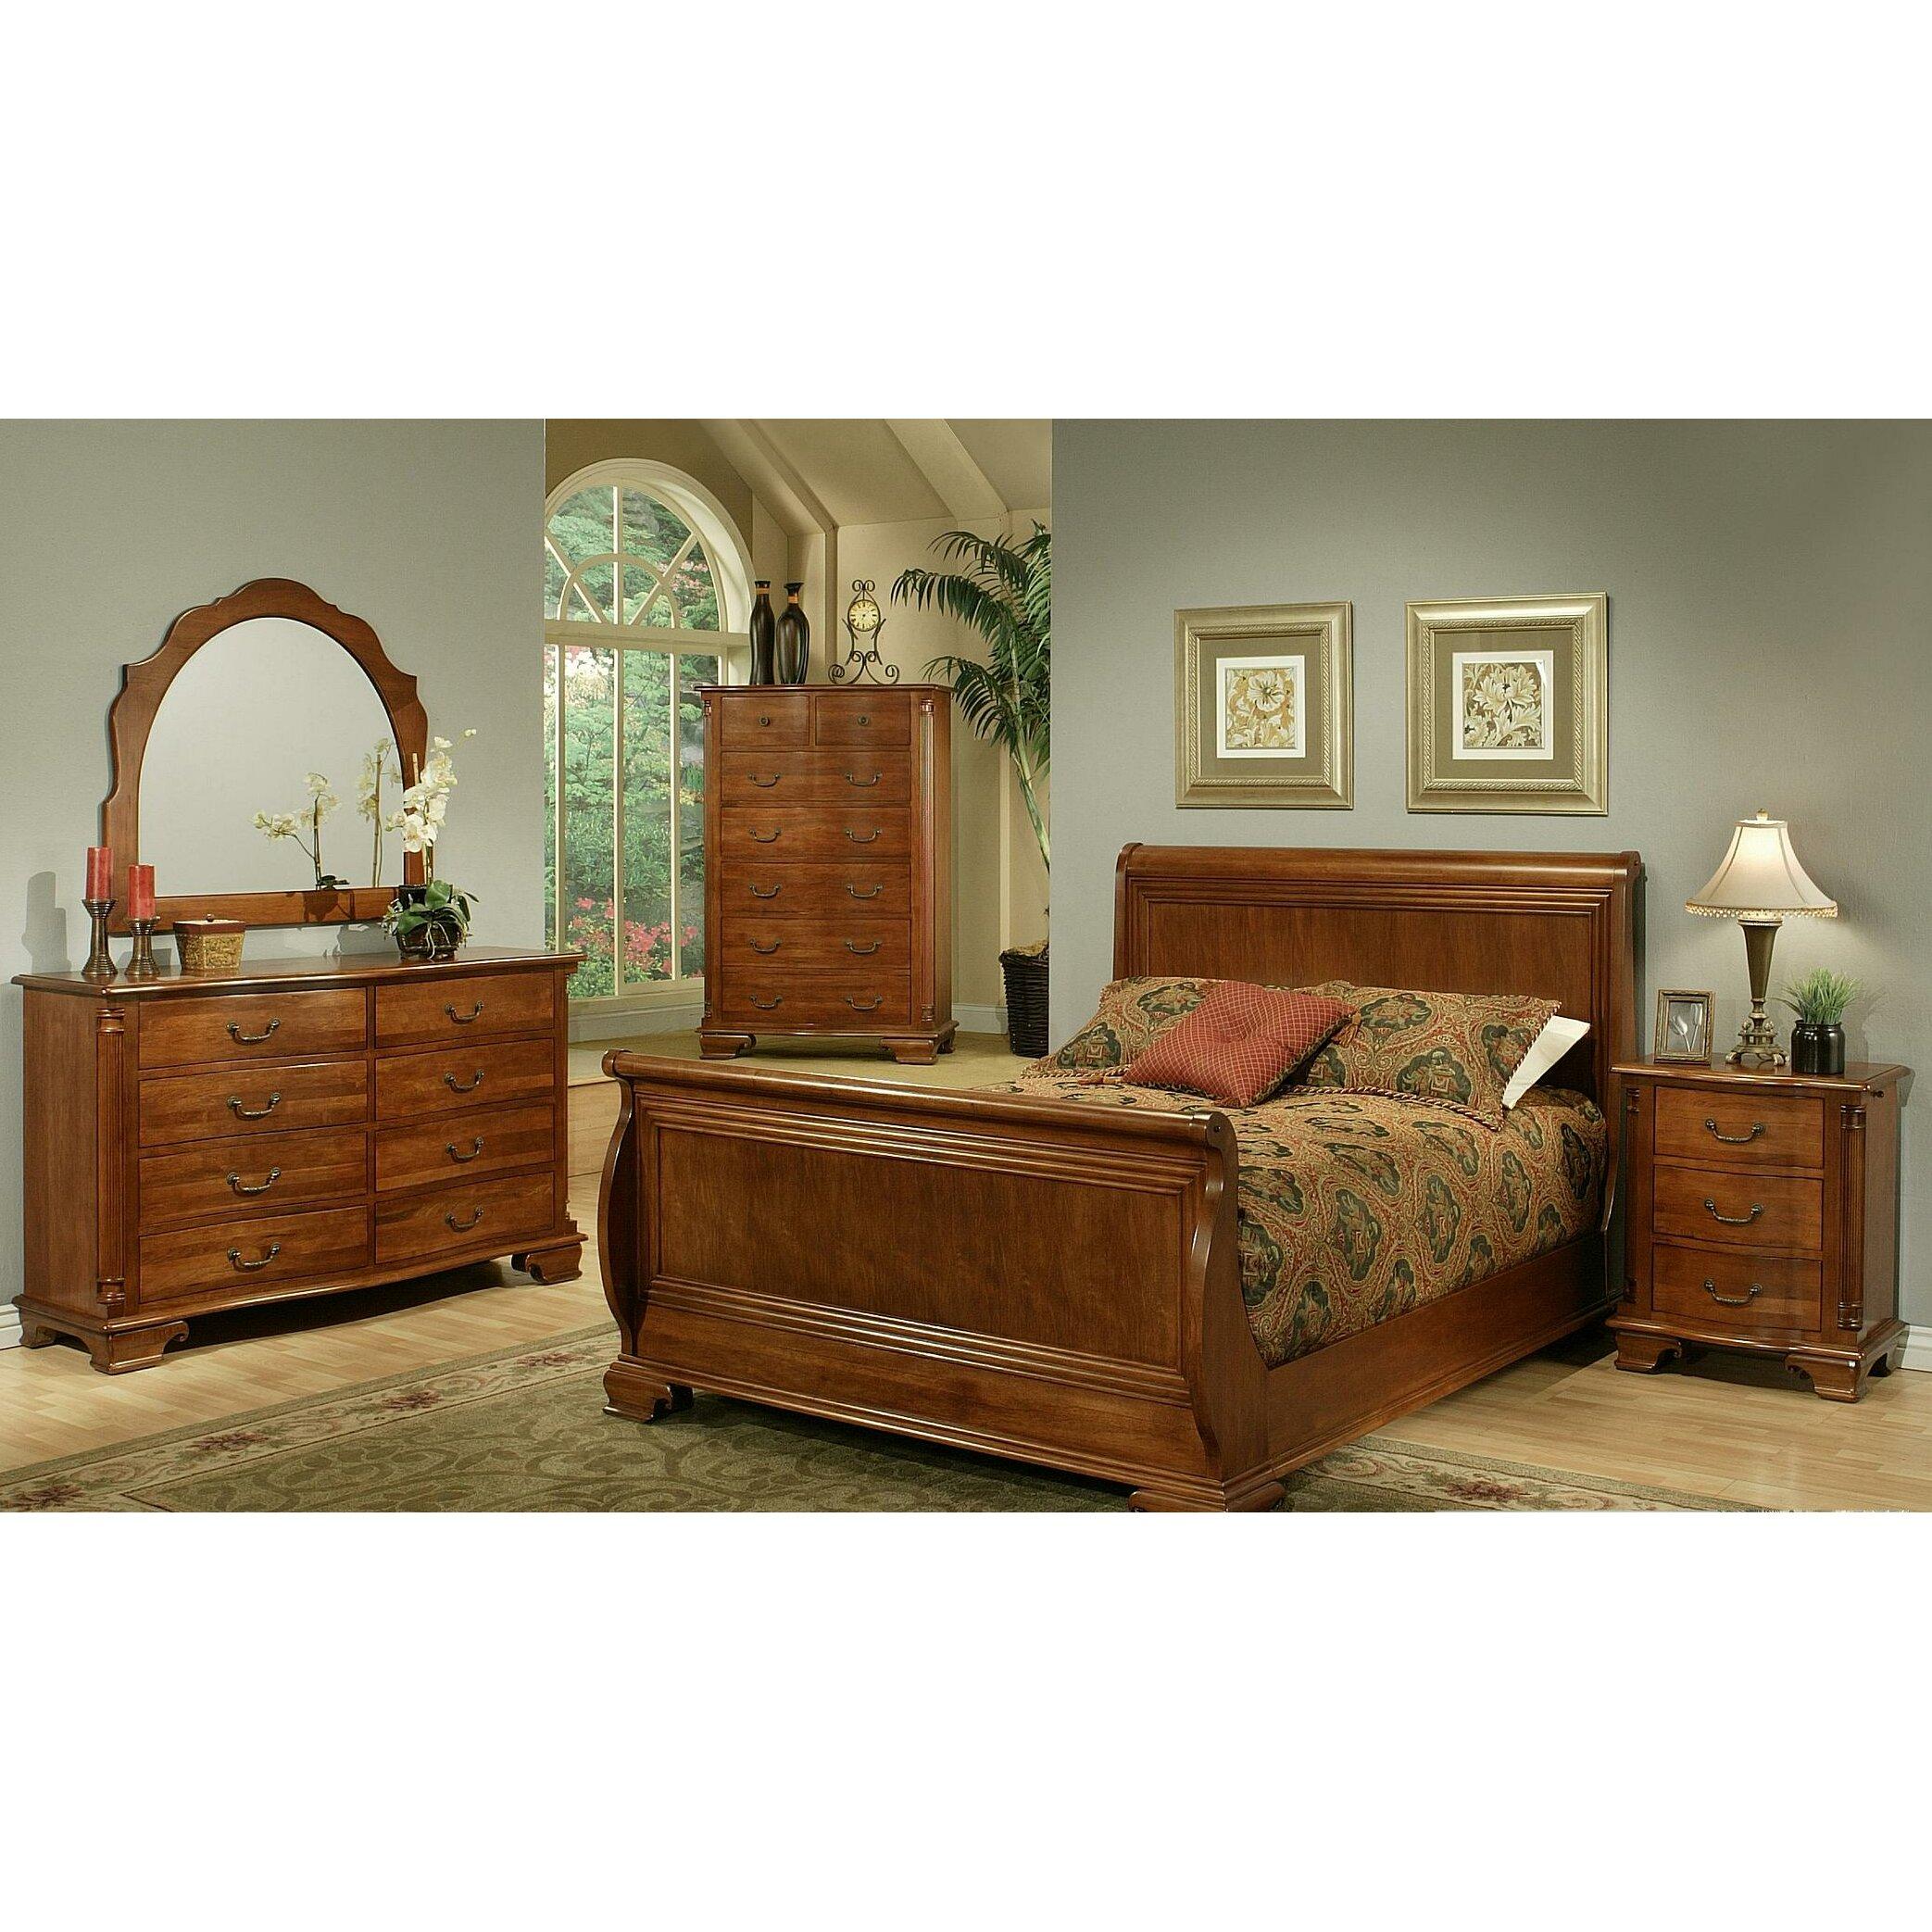 AYCA Furniture American Heritage Sleigh Customizable